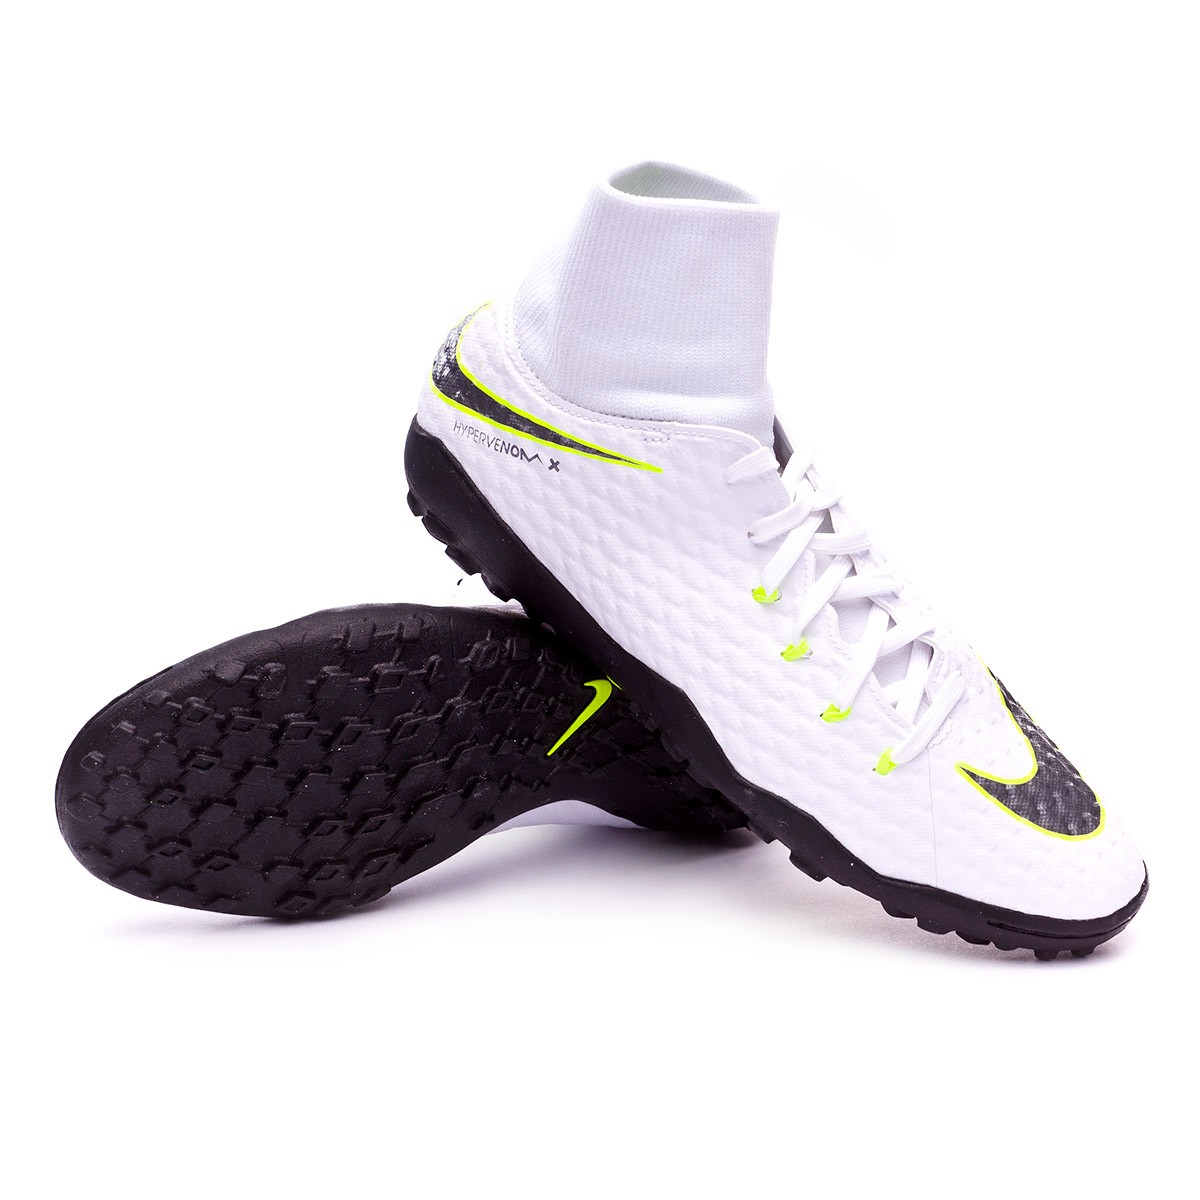 00247d9ed Football Boot Nike Hypervenom PhantomX III Academy DF Turf White ...